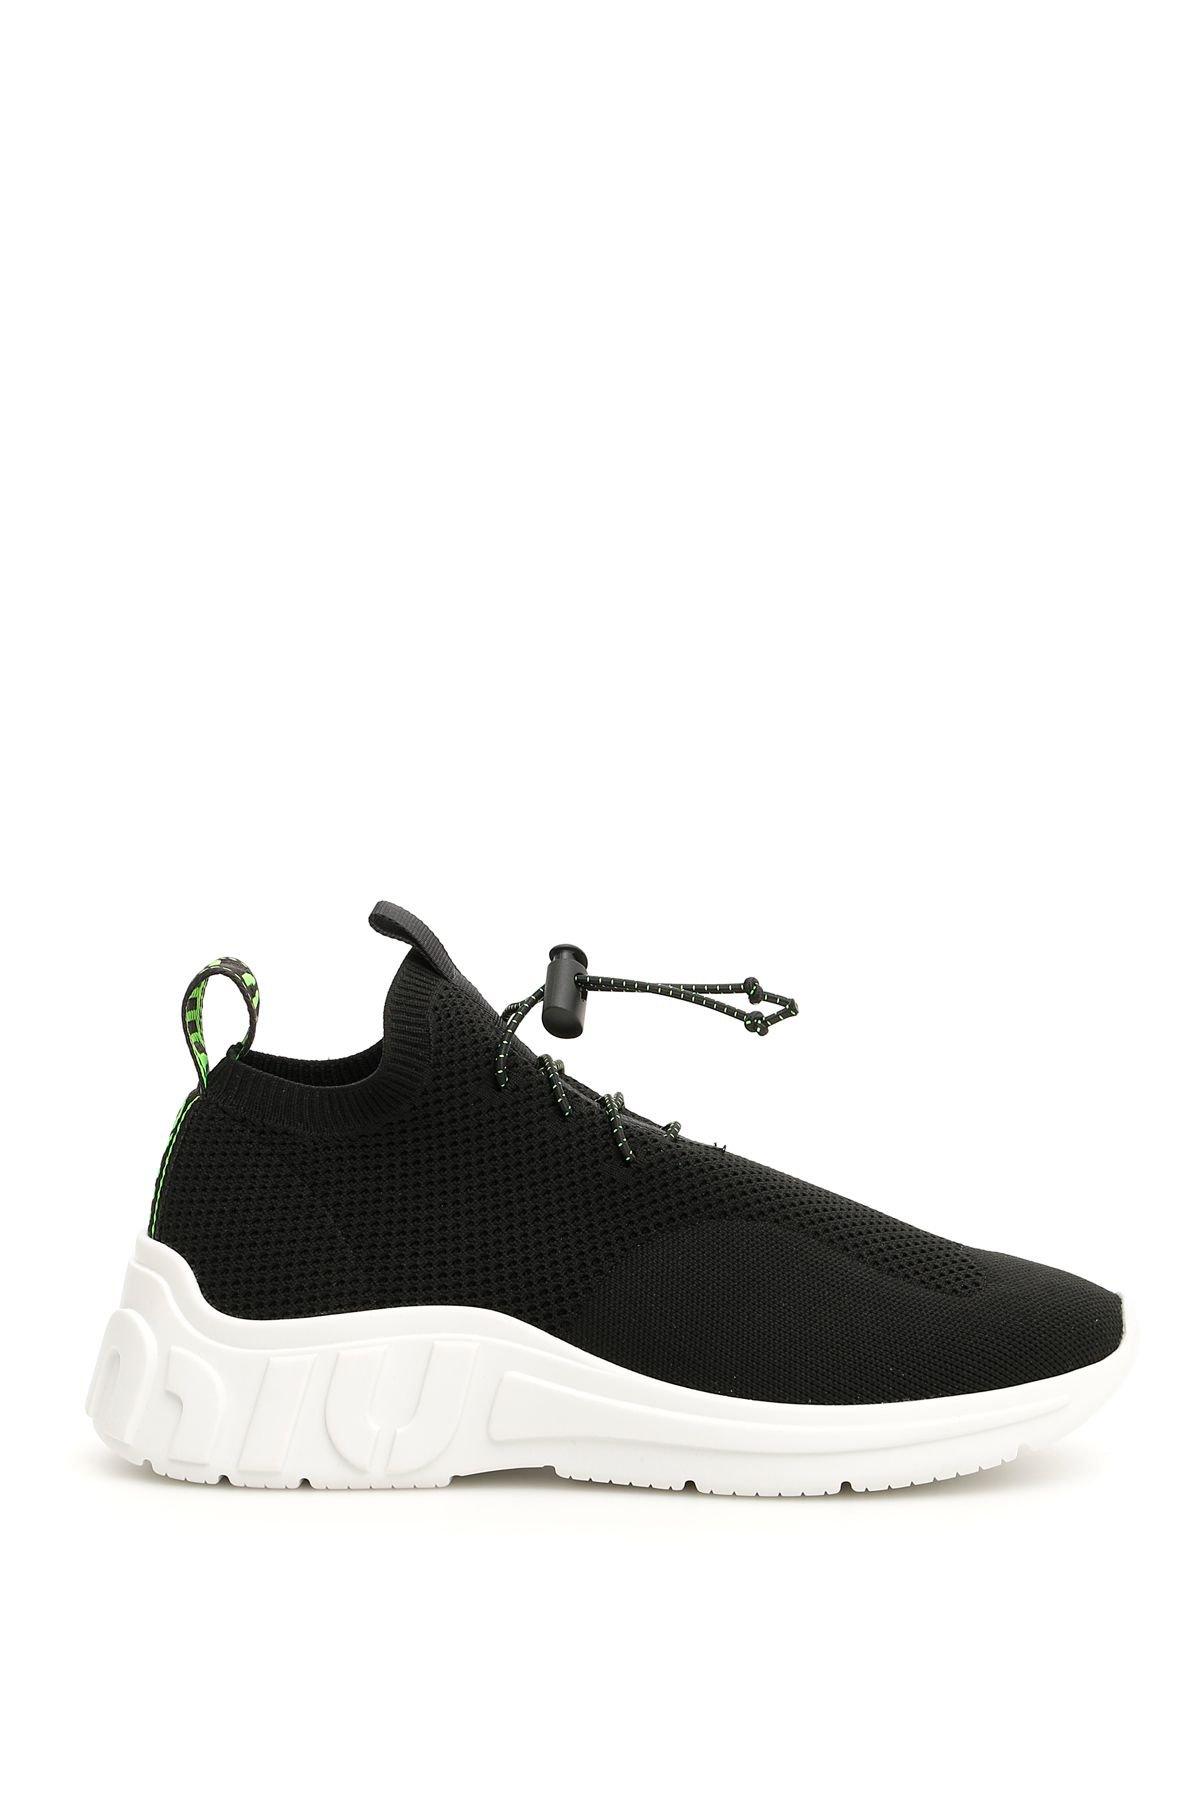 Miu Miu Running Sneakers